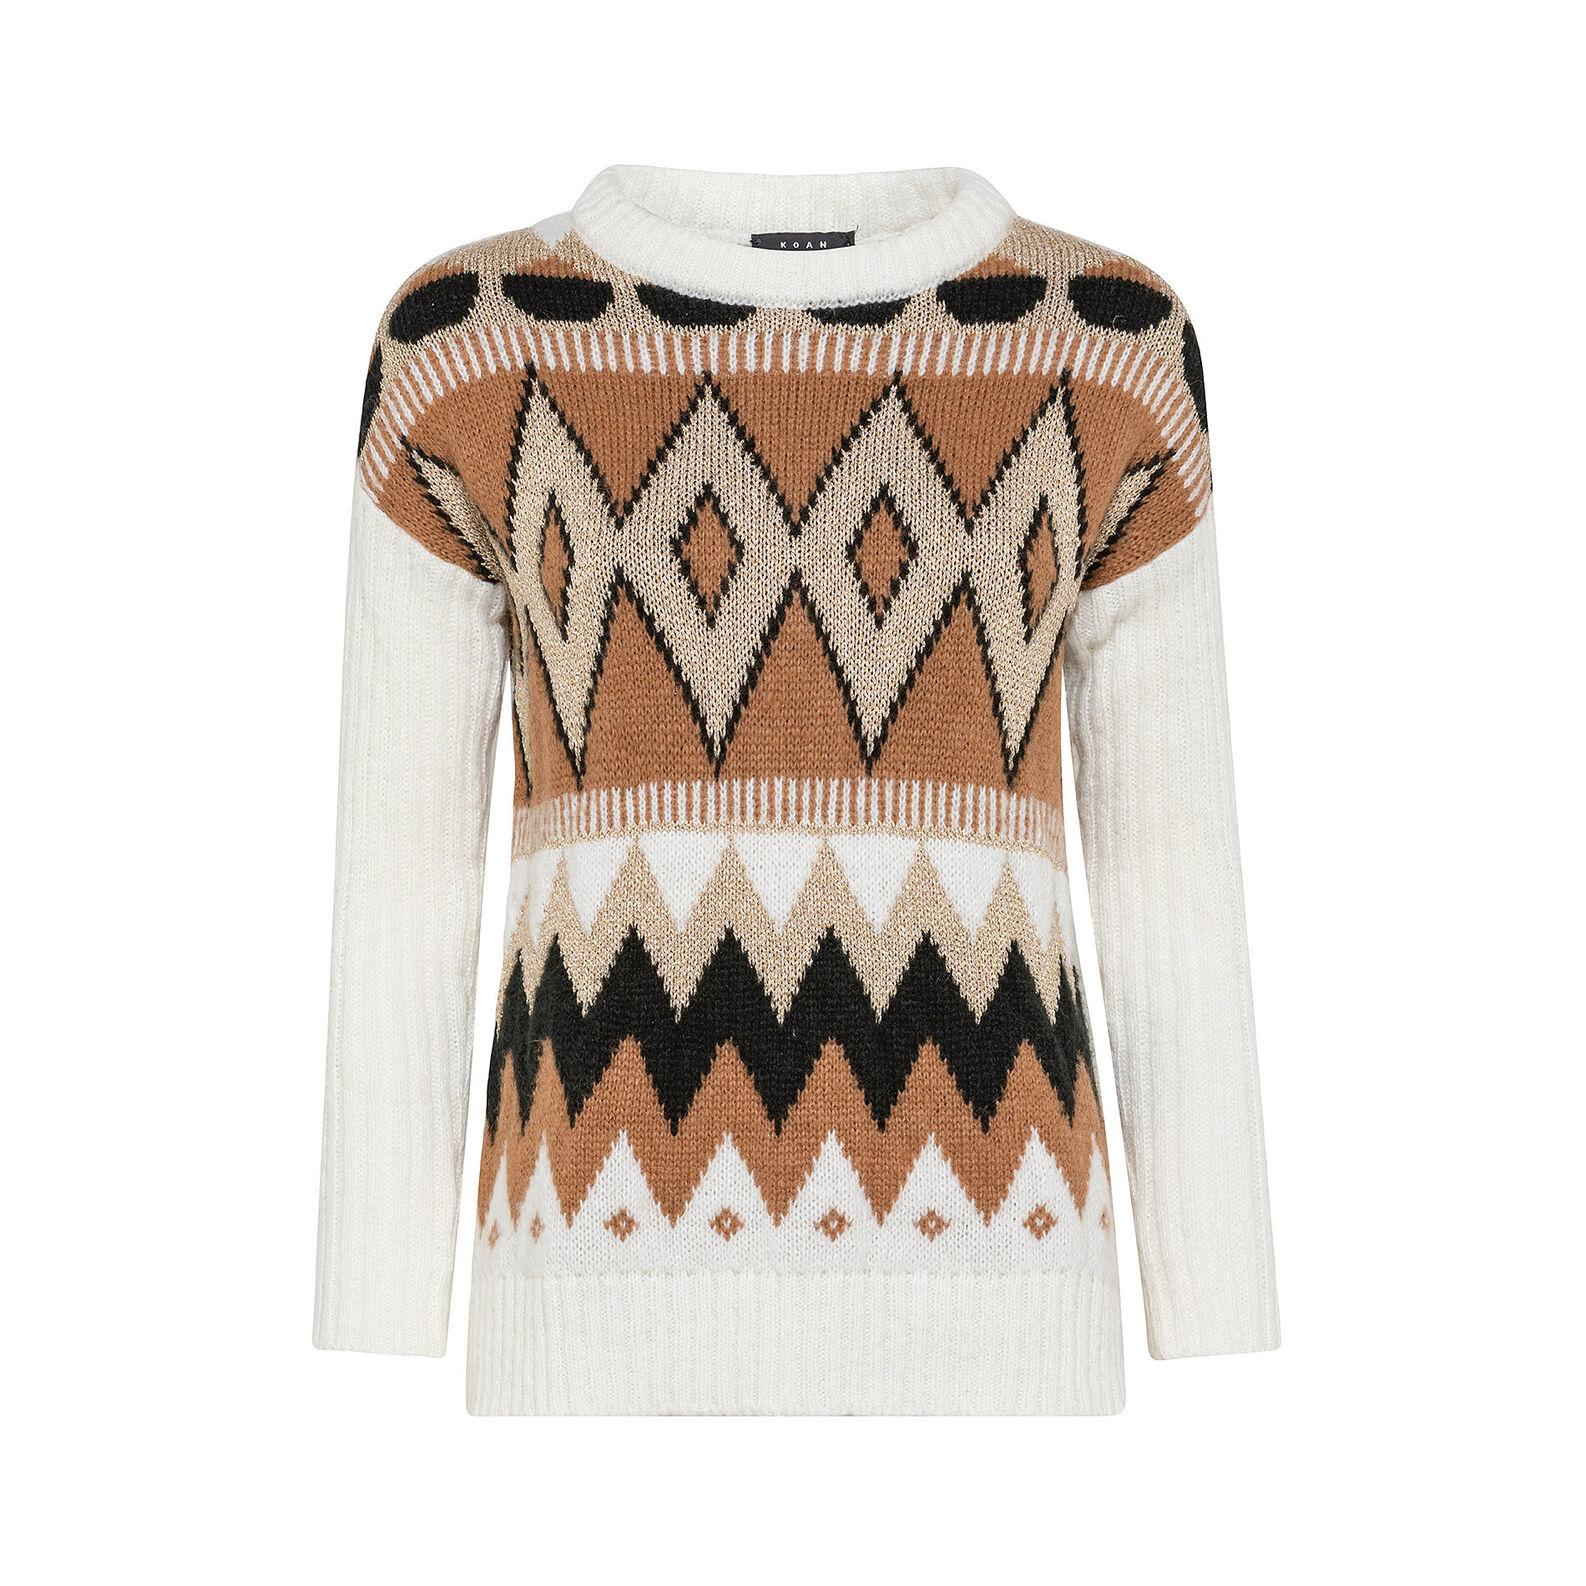 Jacquard design sweater